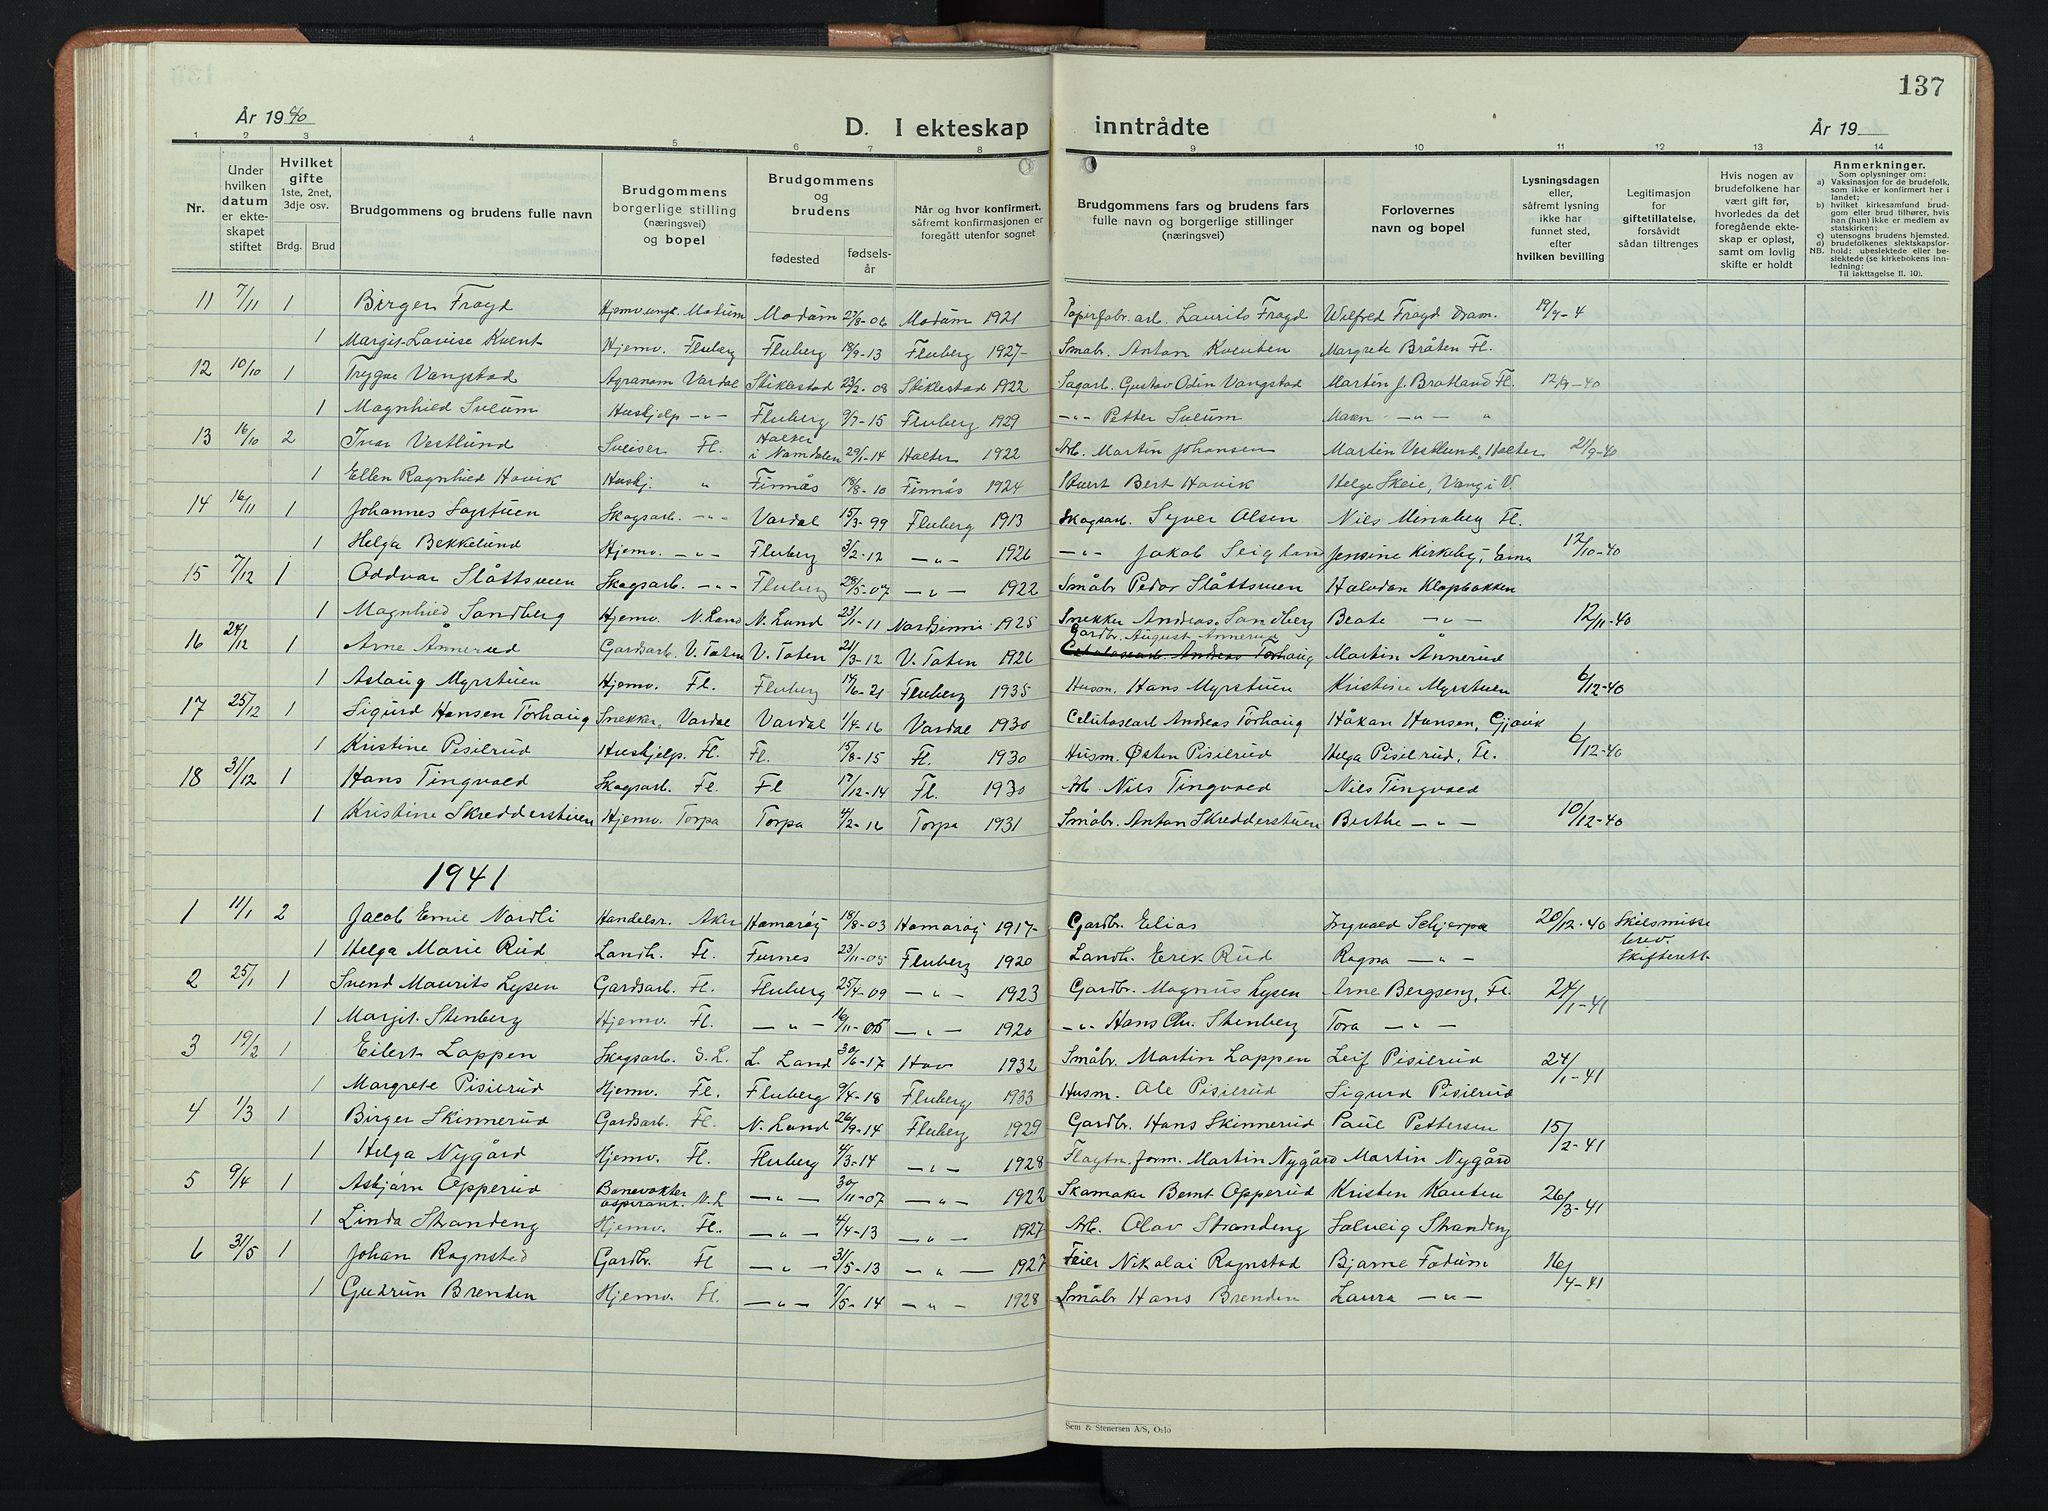 SAH, Søndre Land prestekontor, L/L0008: Klokkerbok nr. 8, 1926-1950, s. 137